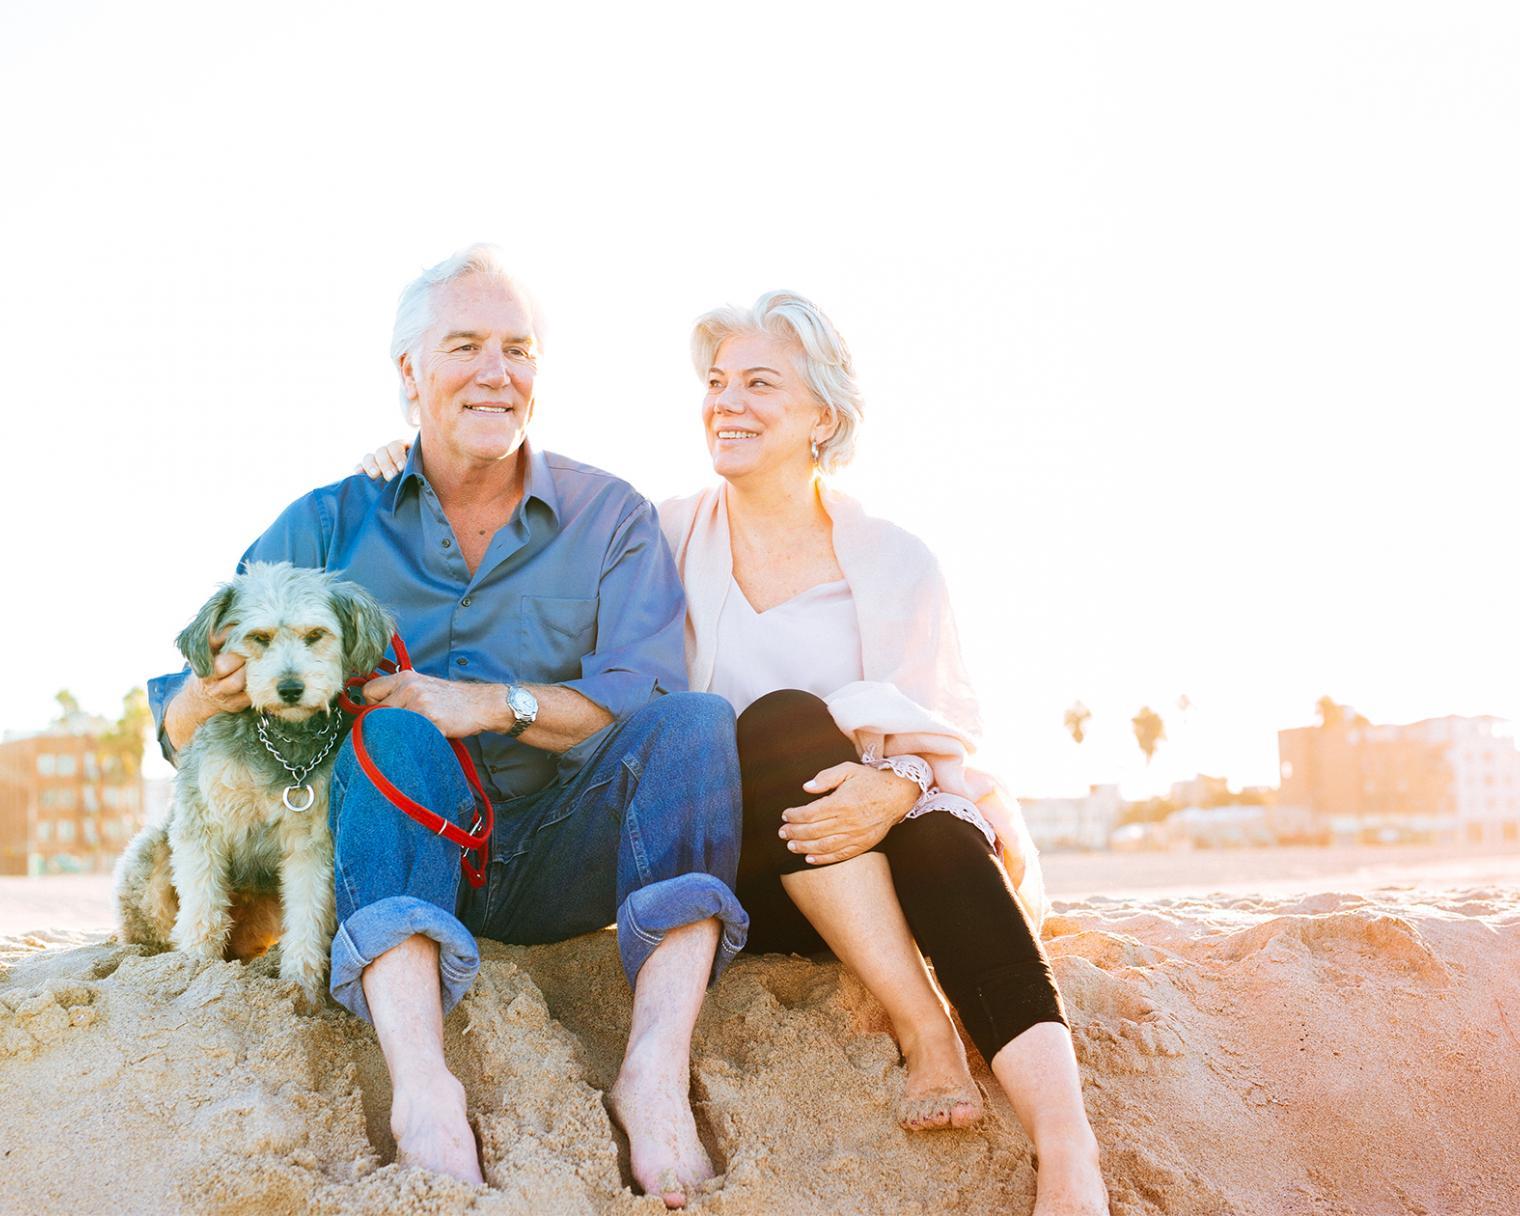 Aktives Paar mit Hund am Strand